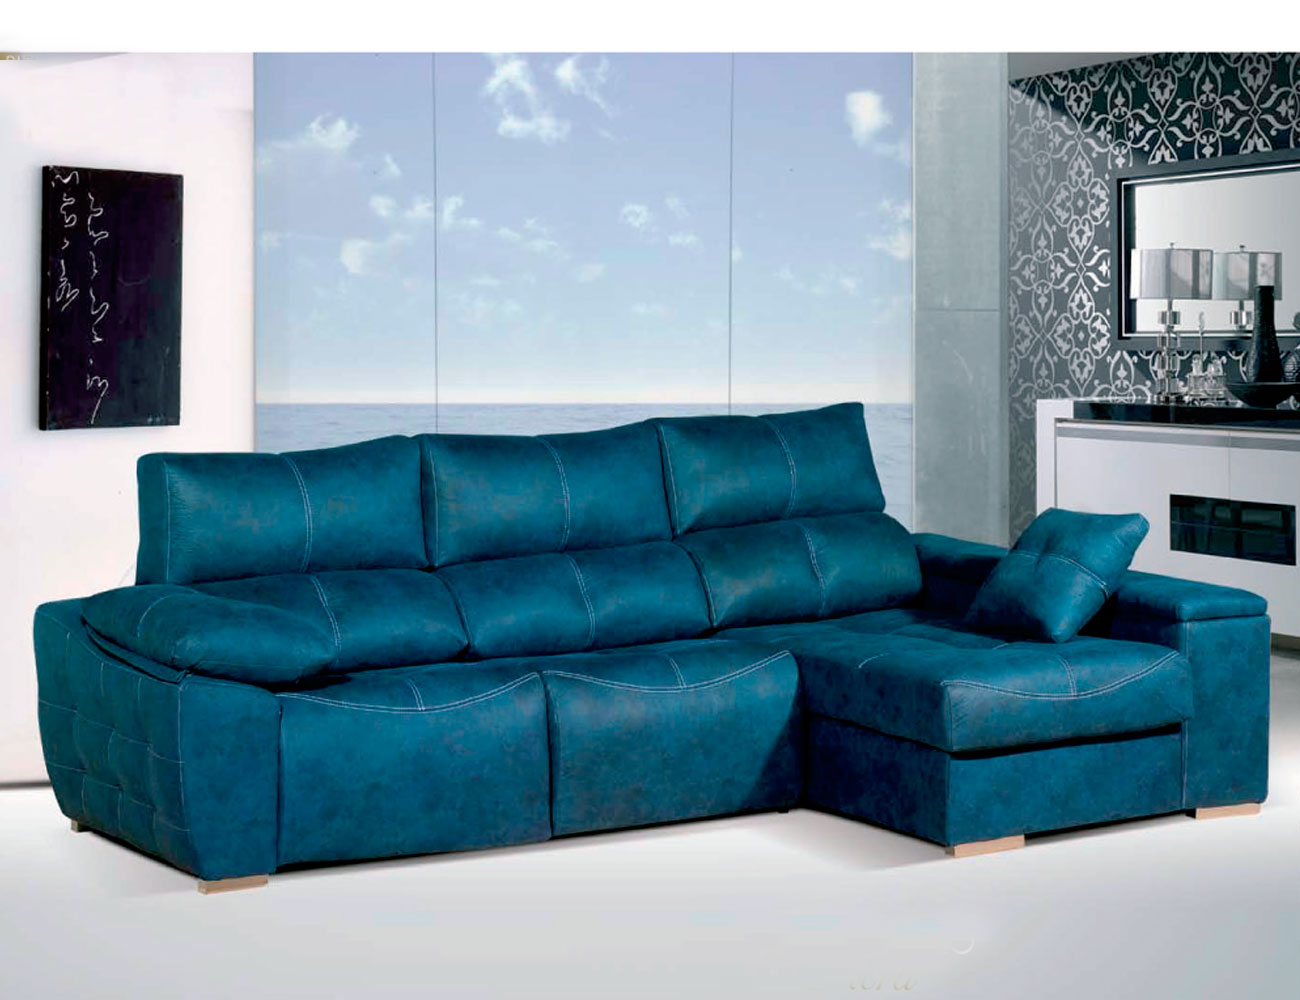 Sofa chaiselongue relax 2 motores anti manchas turquesa21